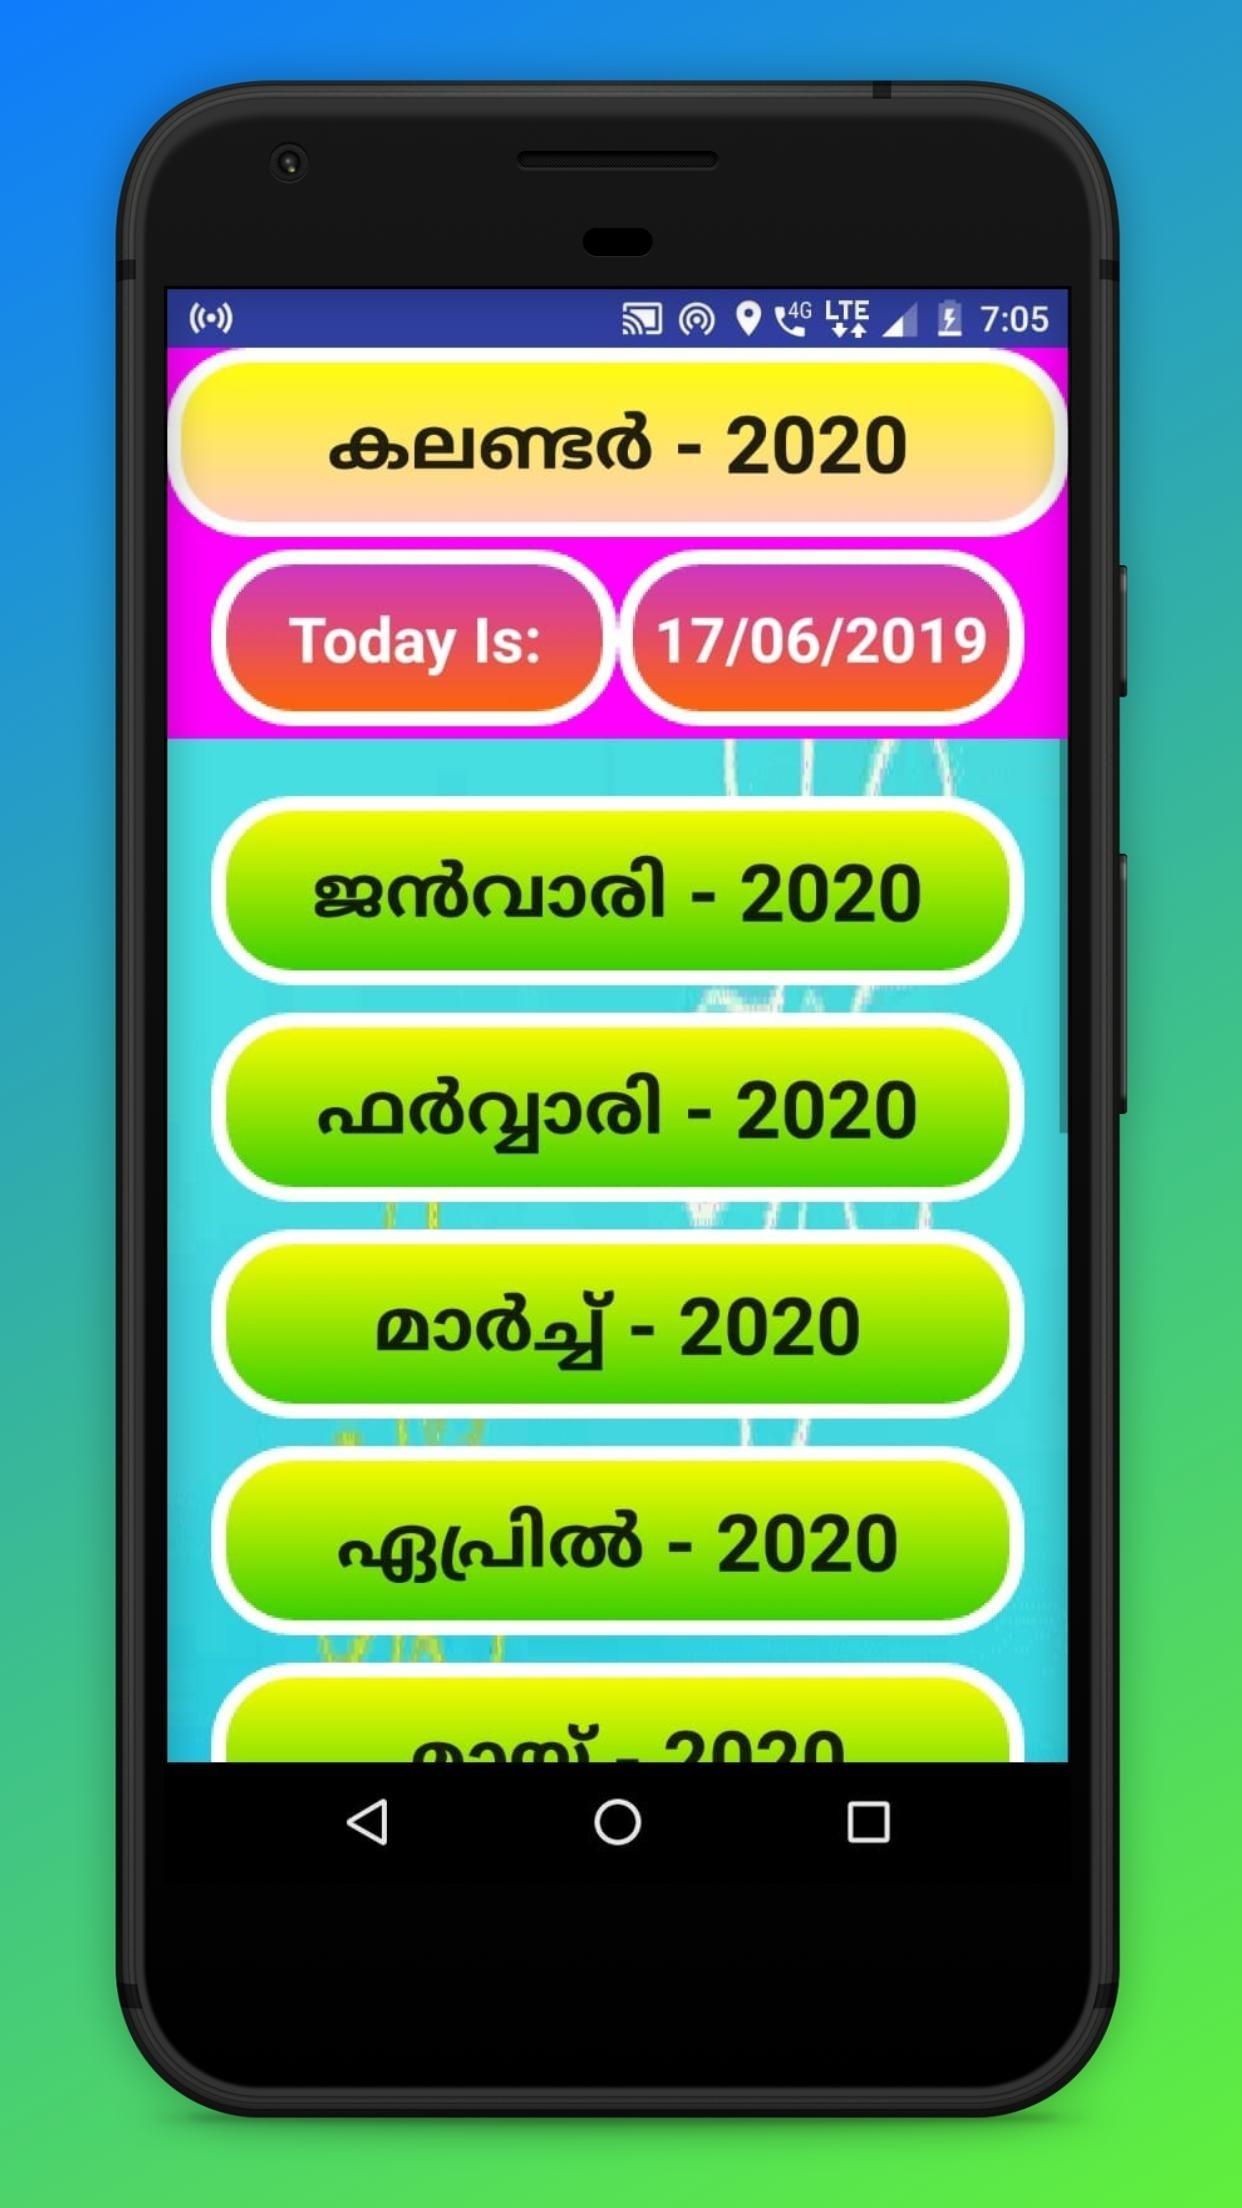 Malayalam Calendar 2020 Malayala Manorama For Android - Apk